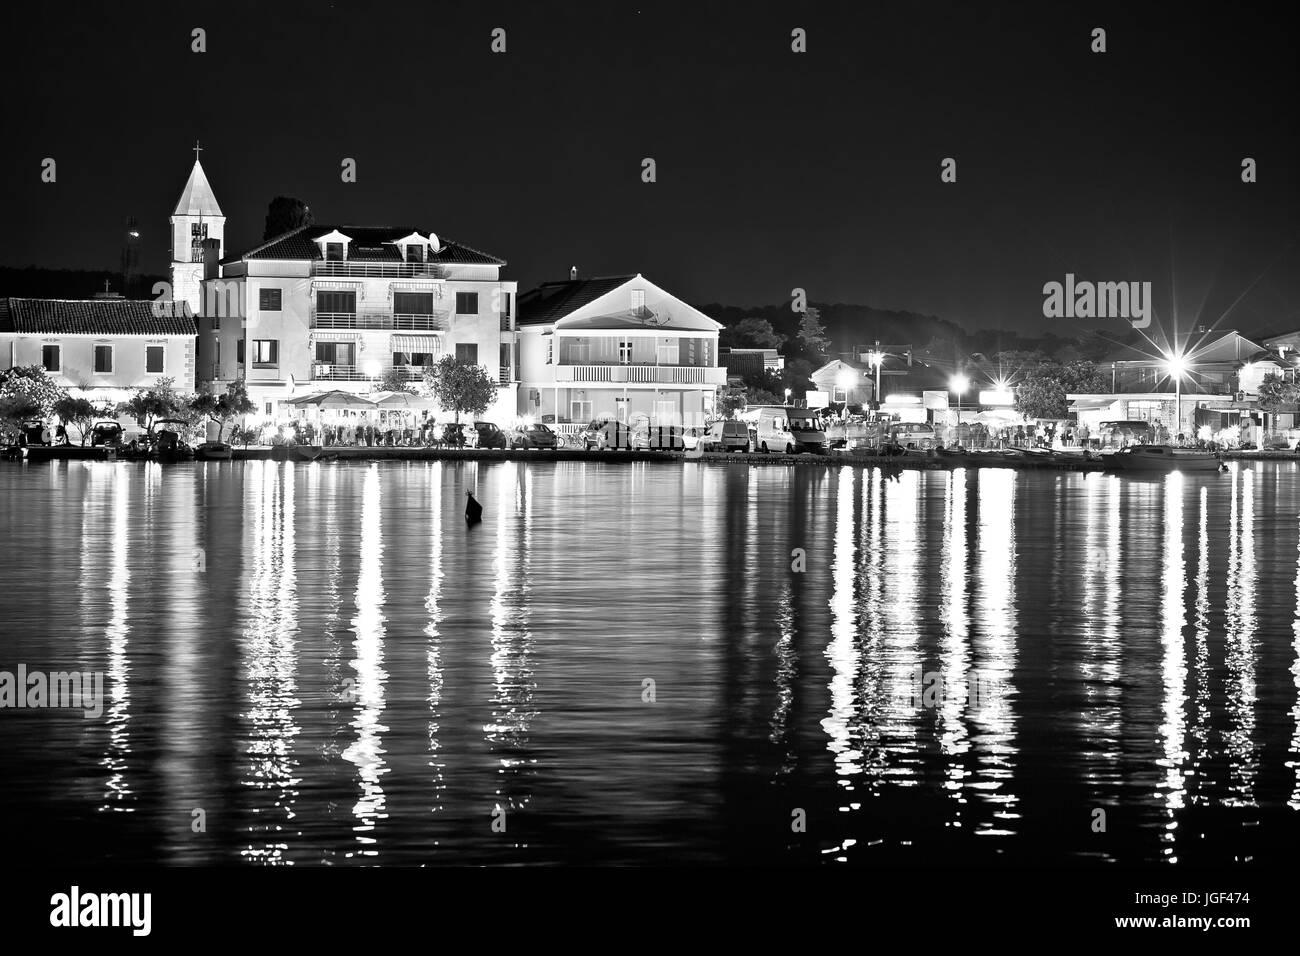 Sukosan Adriatic village evening black and white view, Dalmatia region of Croatia - Stock Image